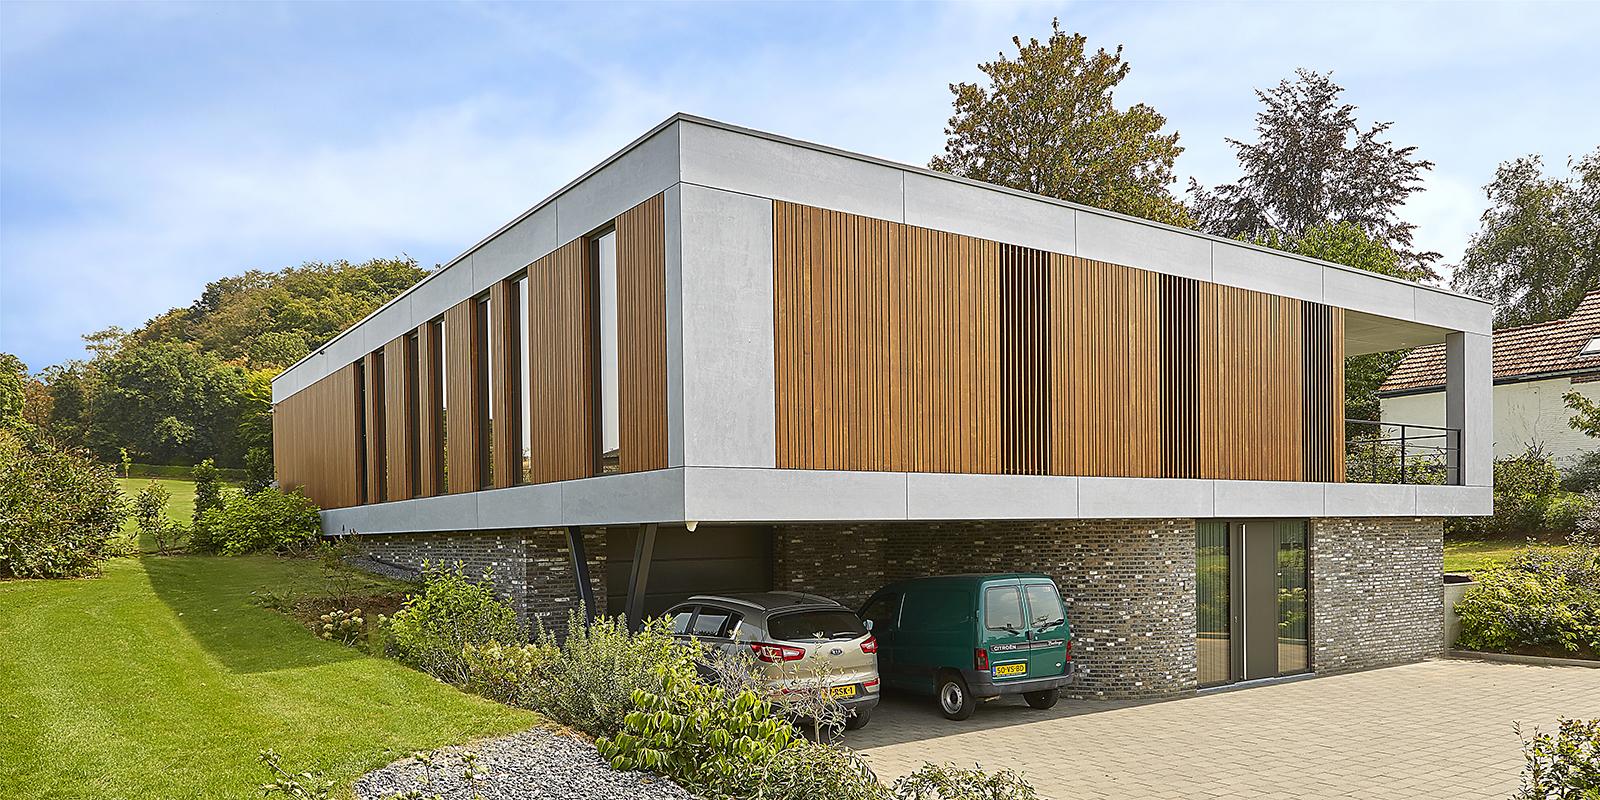 Moderne stijl, 3D visie, Modern, Minimalistische woning, Houtelementen, Strak, Exterieur, Beton, Schrijnwerk, Natuurschoon, Landgoed